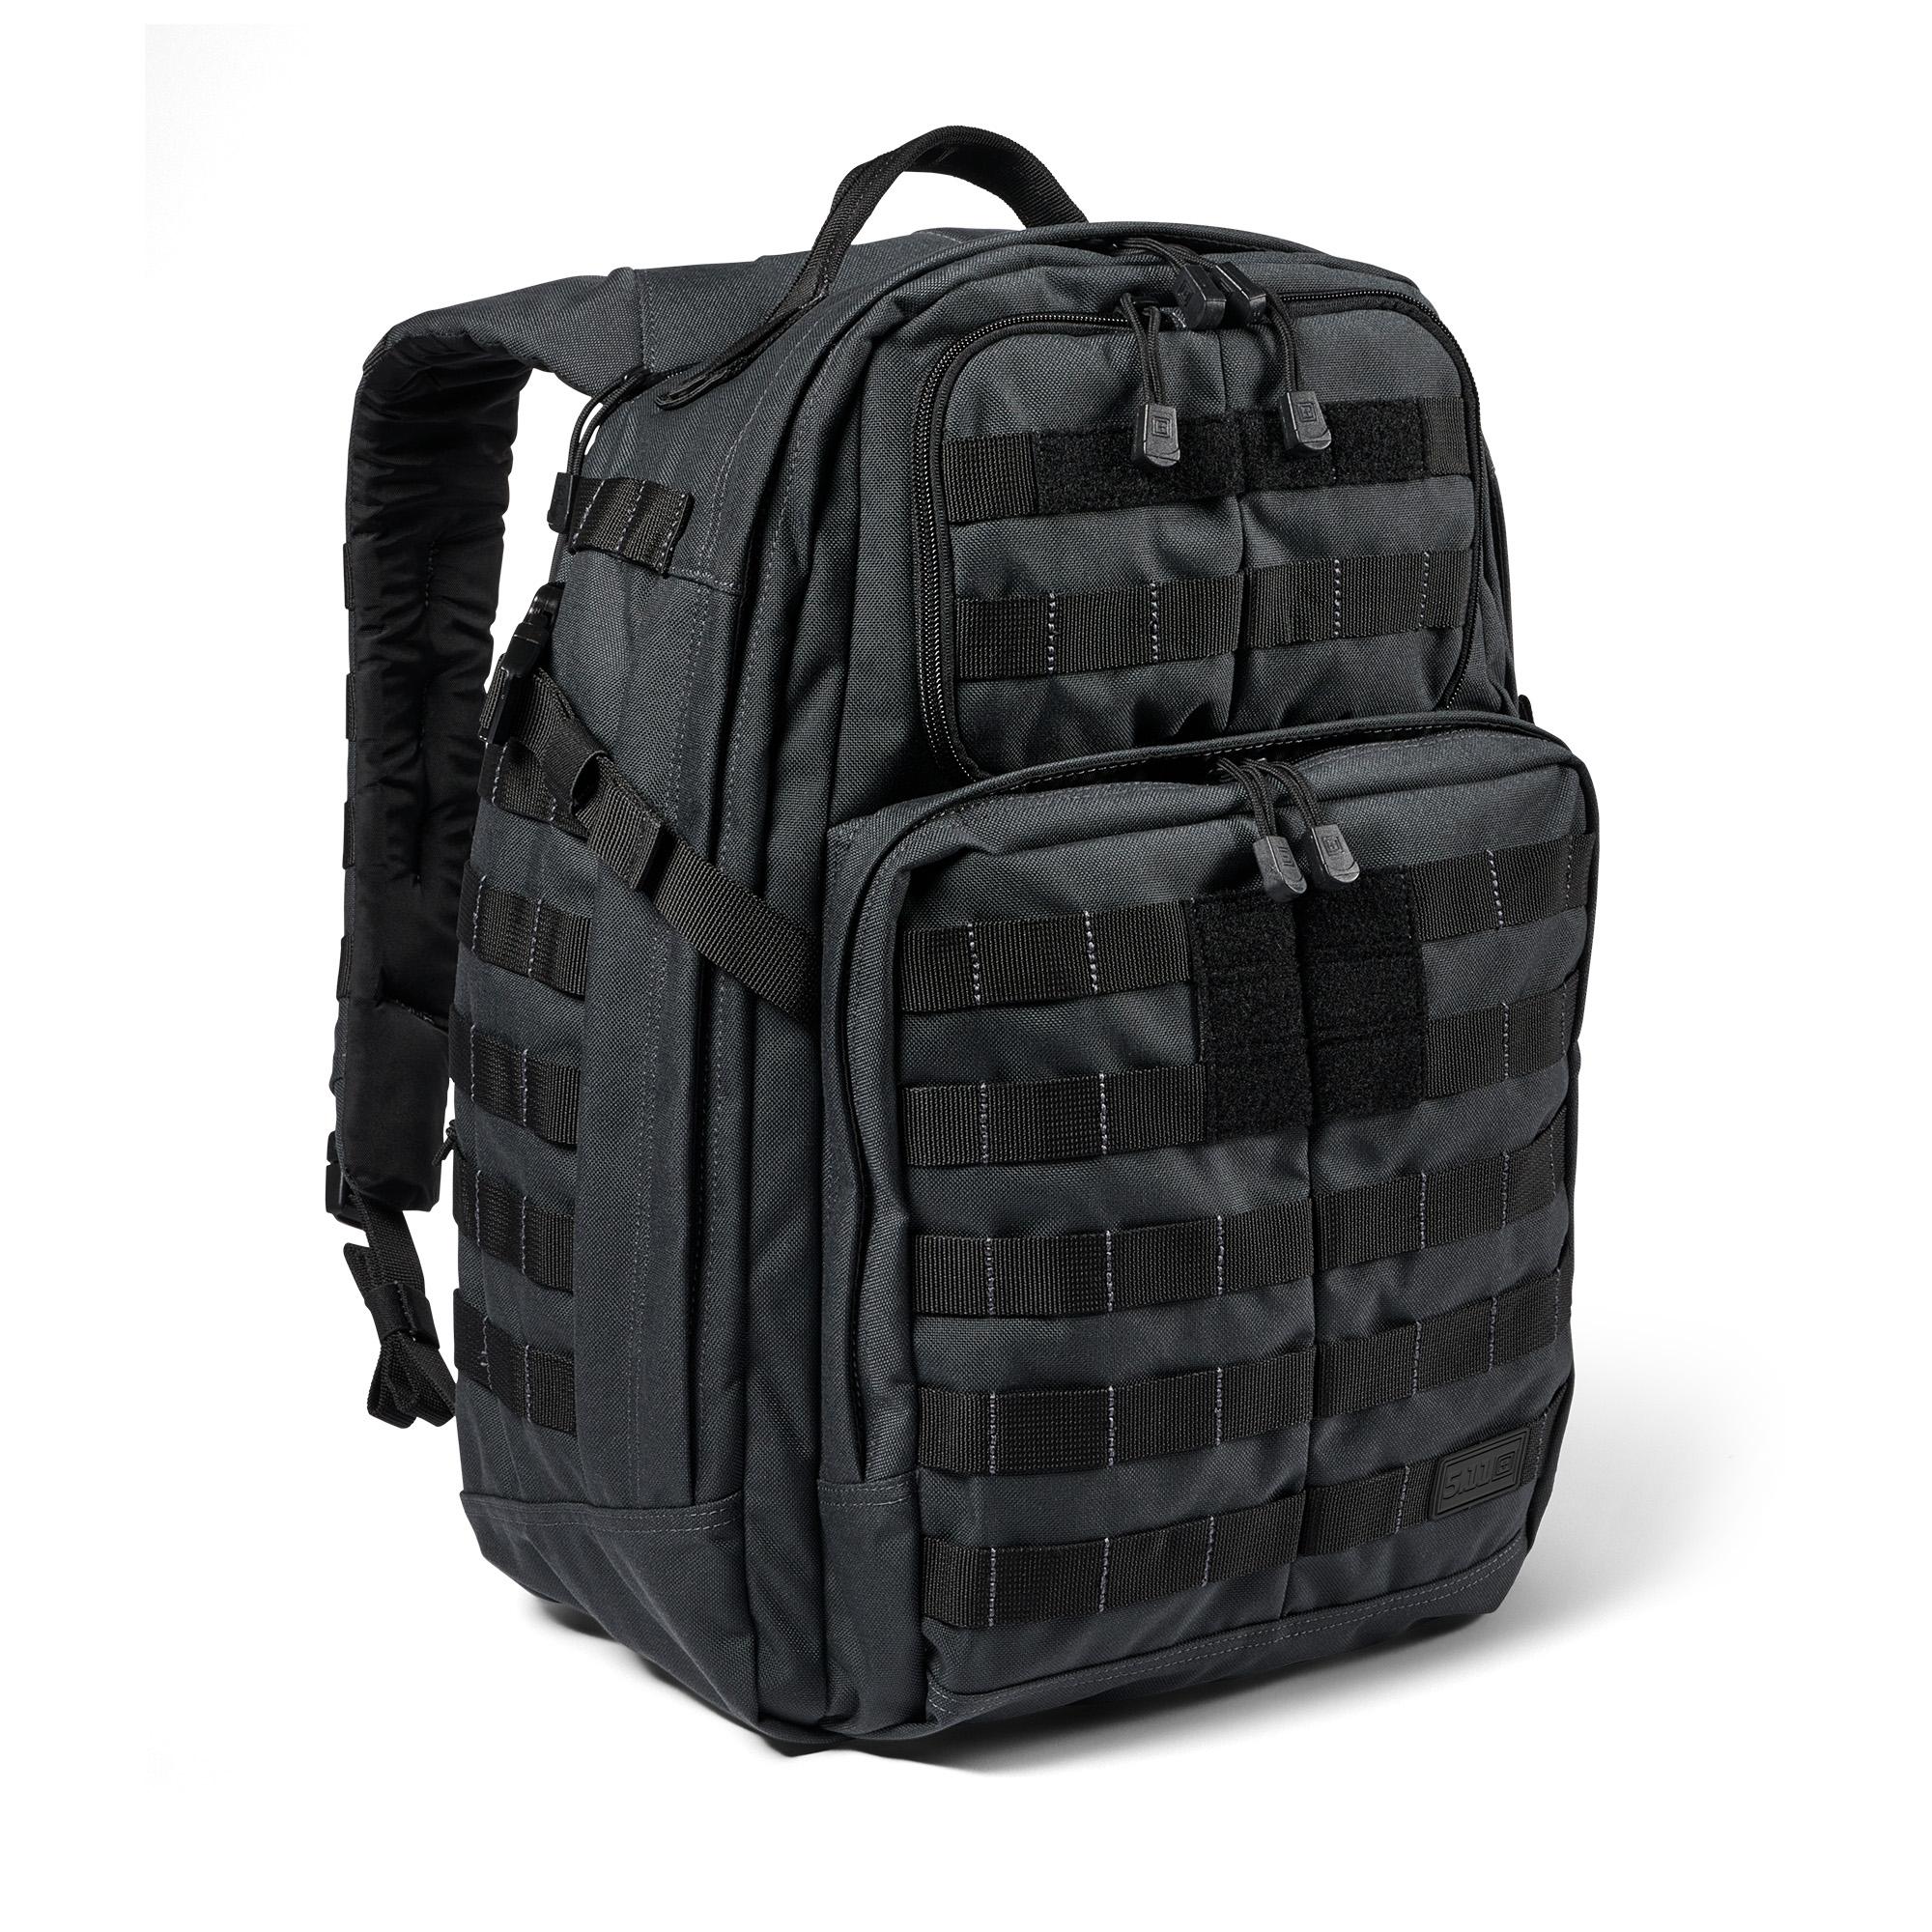 Balo 5.11 Tactical Rush 24 2.0